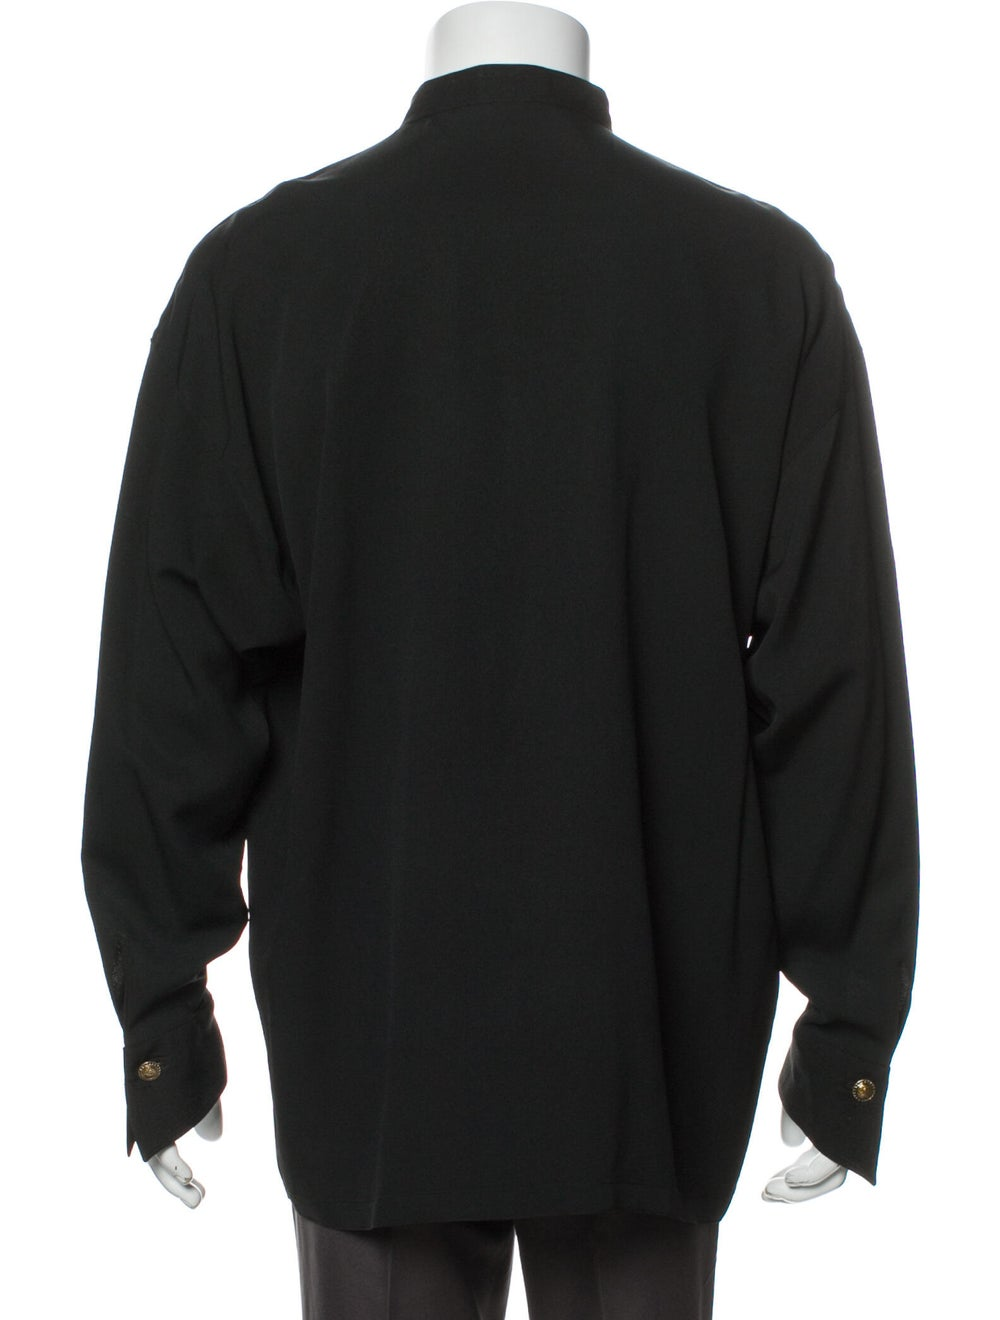 Gianni Versace Vintage 1990's Shirt Black - image 3